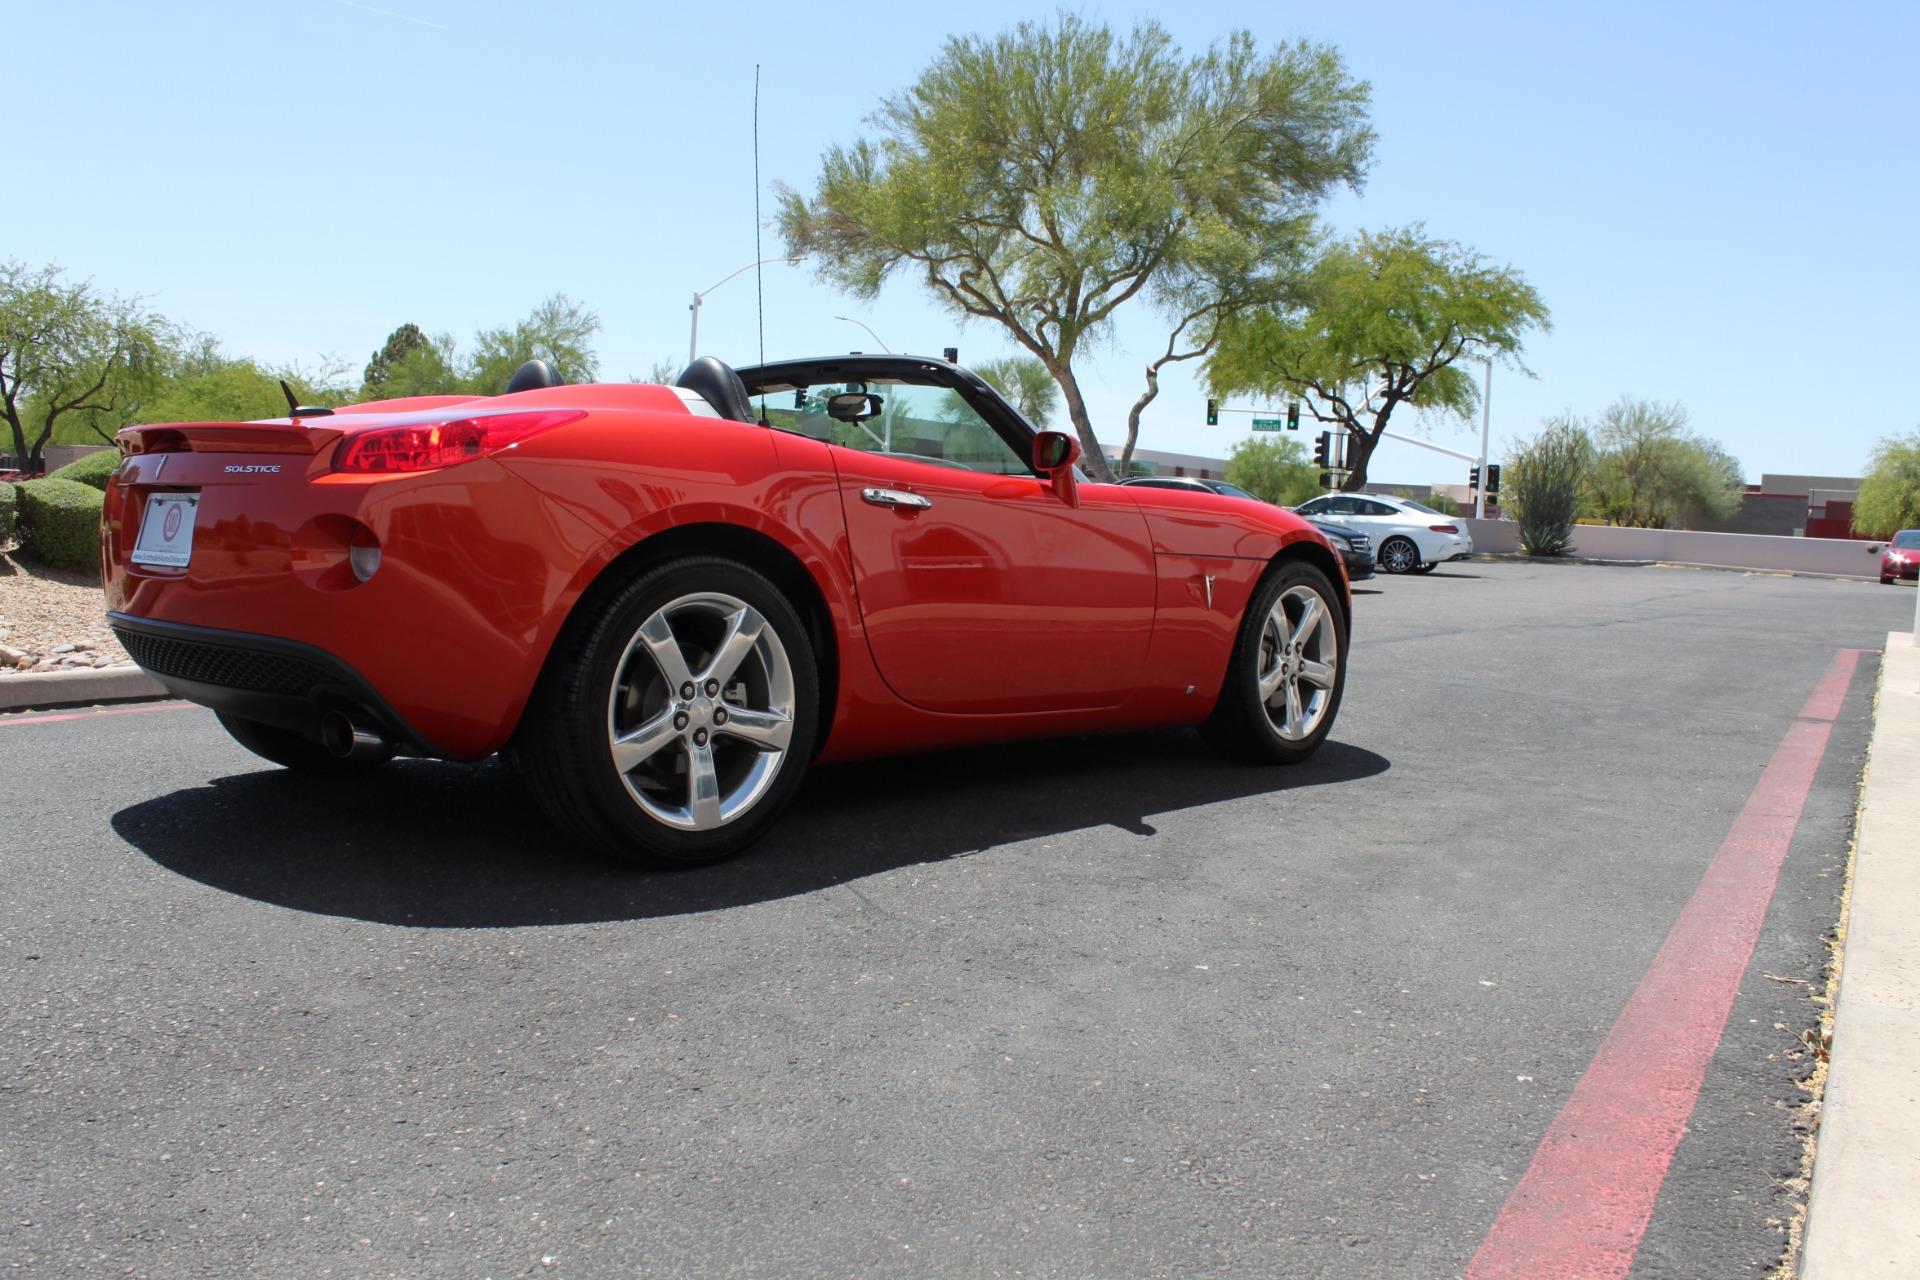 Used-2008-Pontiac-Solstice-Ford